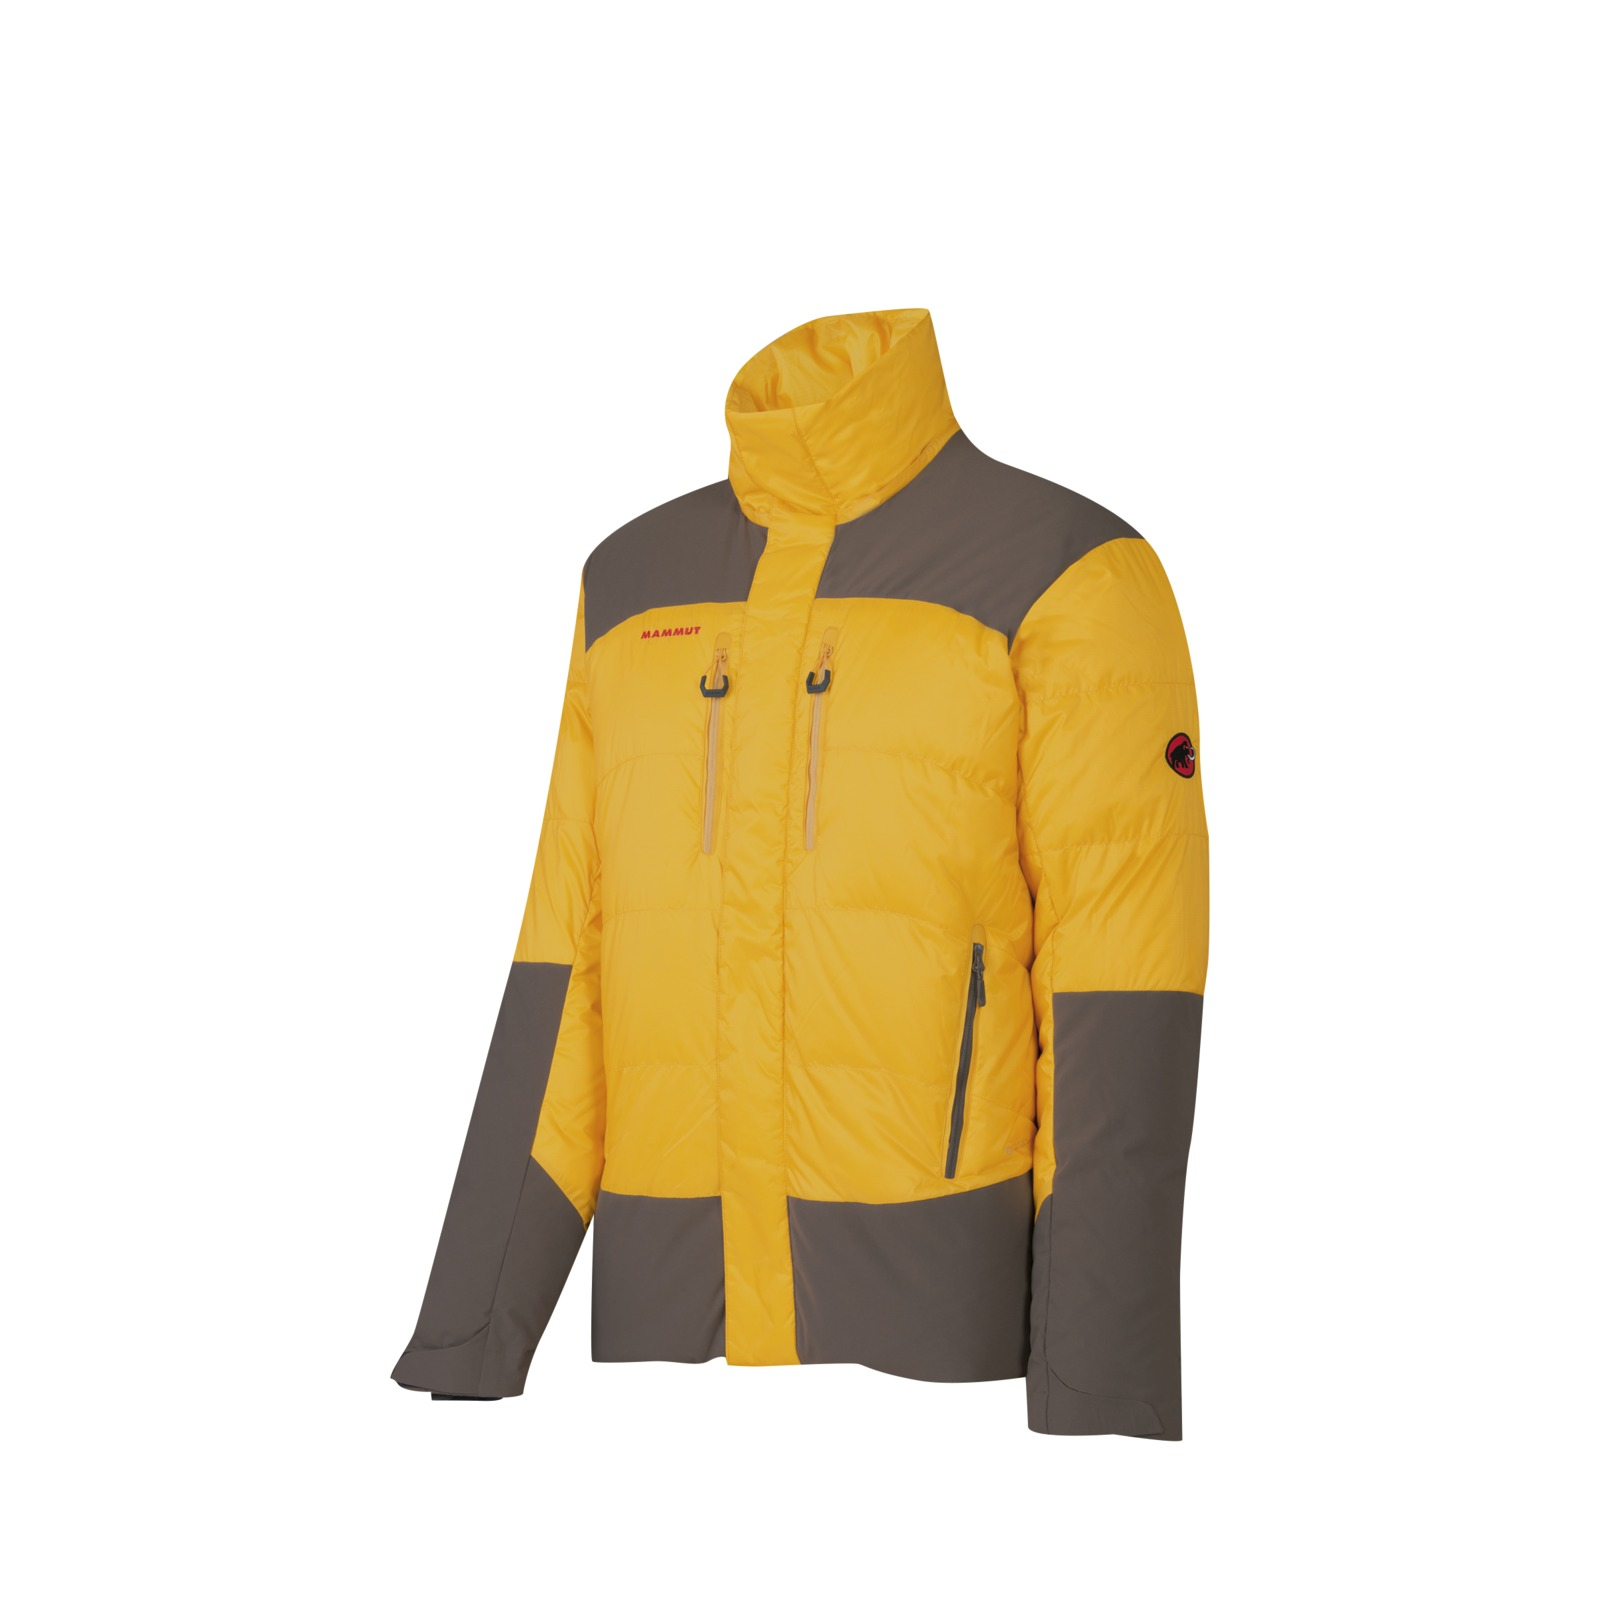 Mammut Ambler Pro IS Hooded Jacket